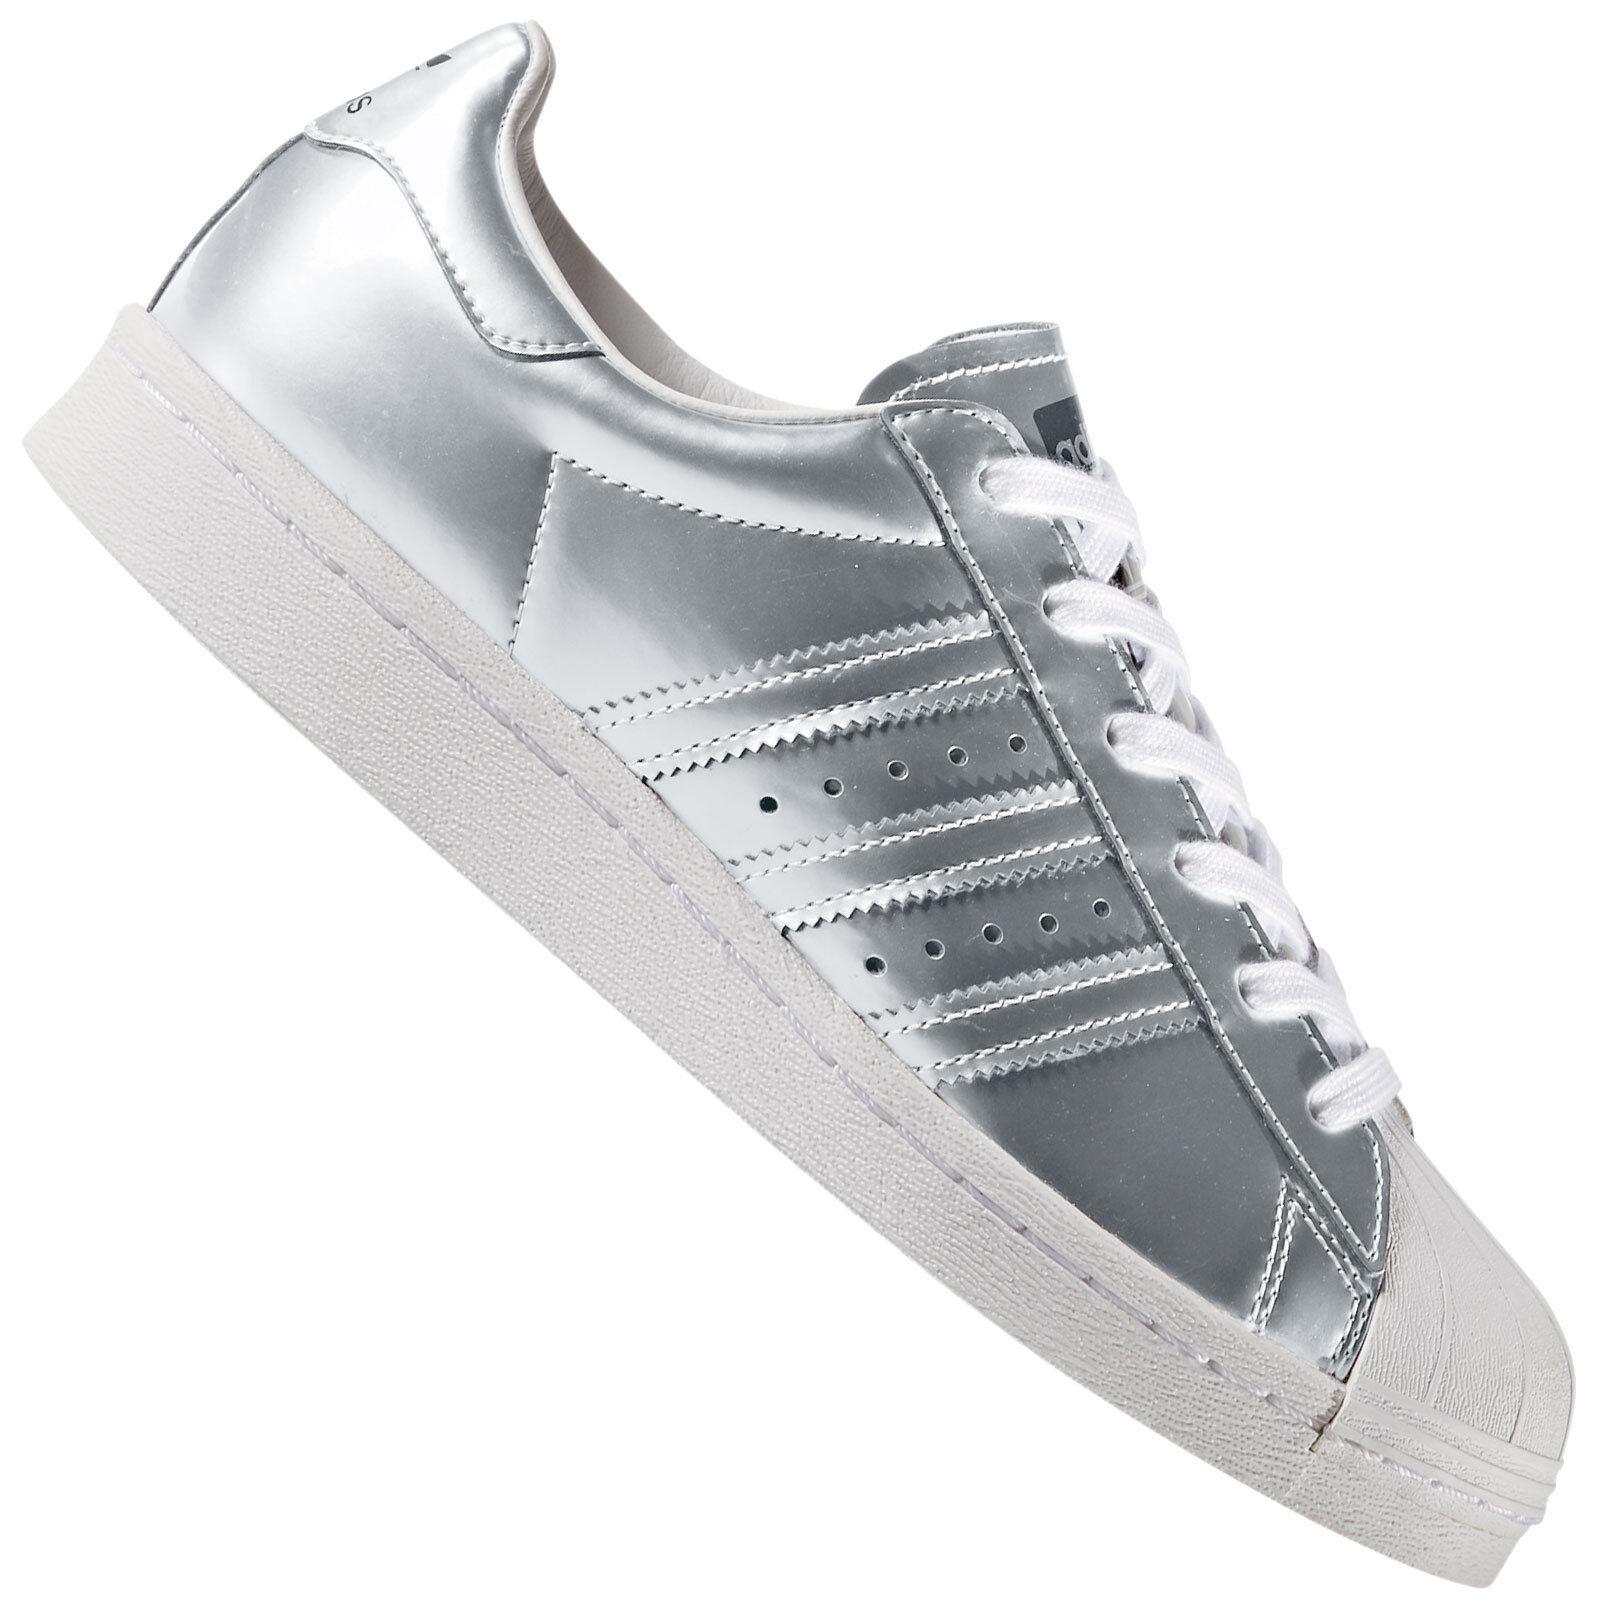 Adidas Originals Superstar Boost donna scarpe da ginnastica Trainers Sport  scarpe Footwear New  memorizzare